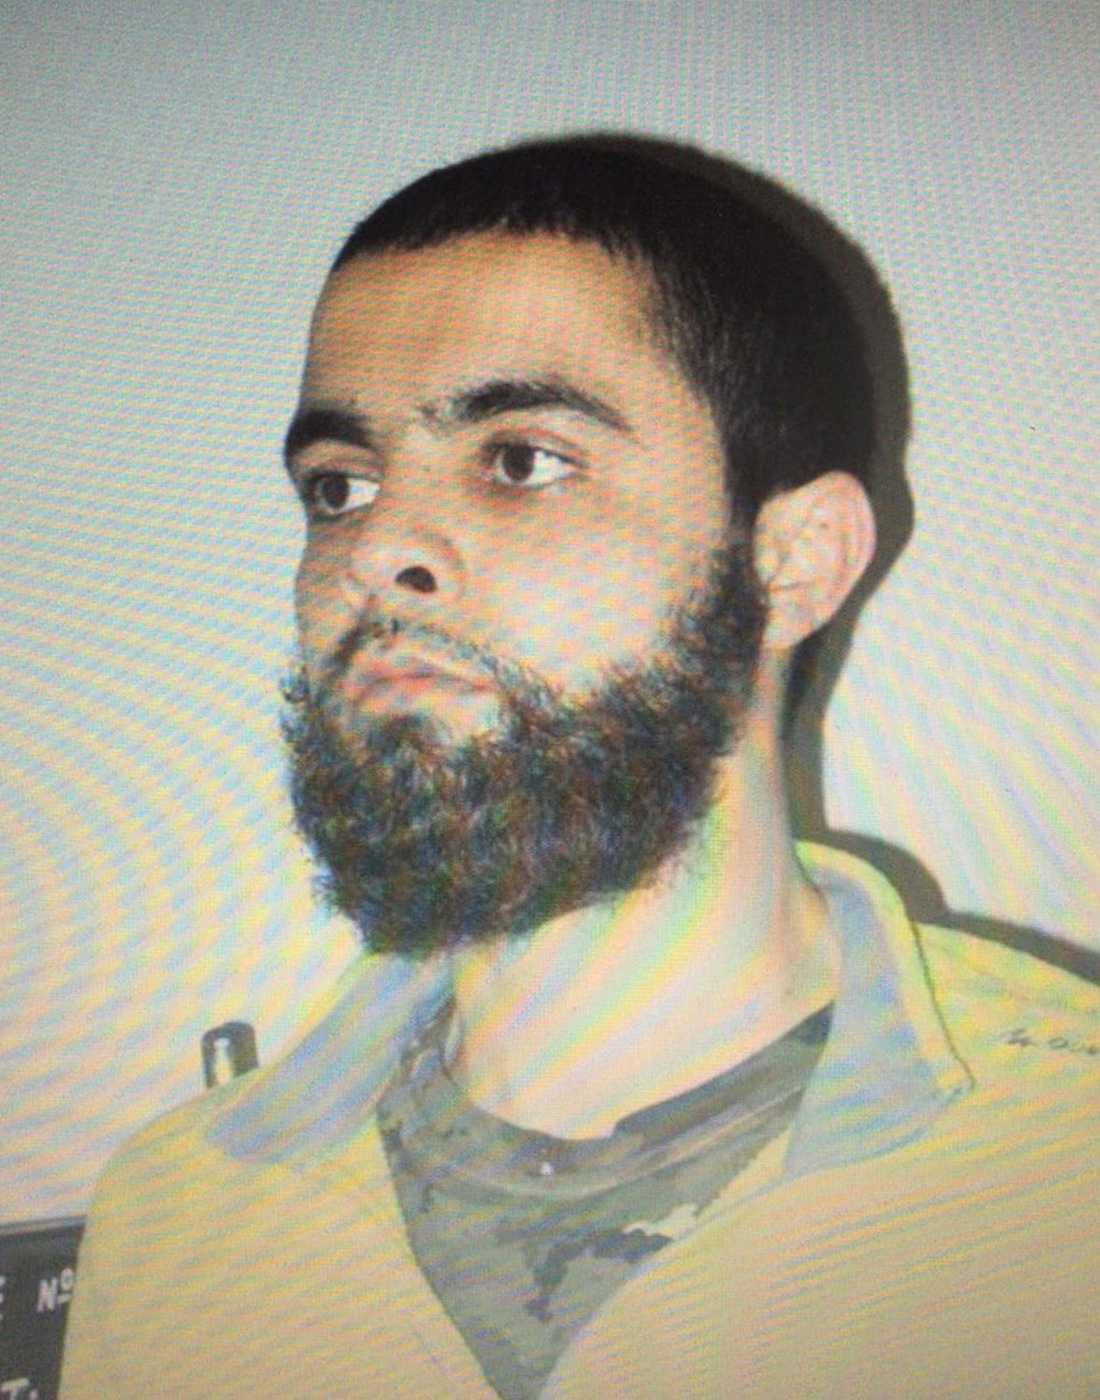 Den utpekade gärningsmannen Radouane Lakdim , 26.